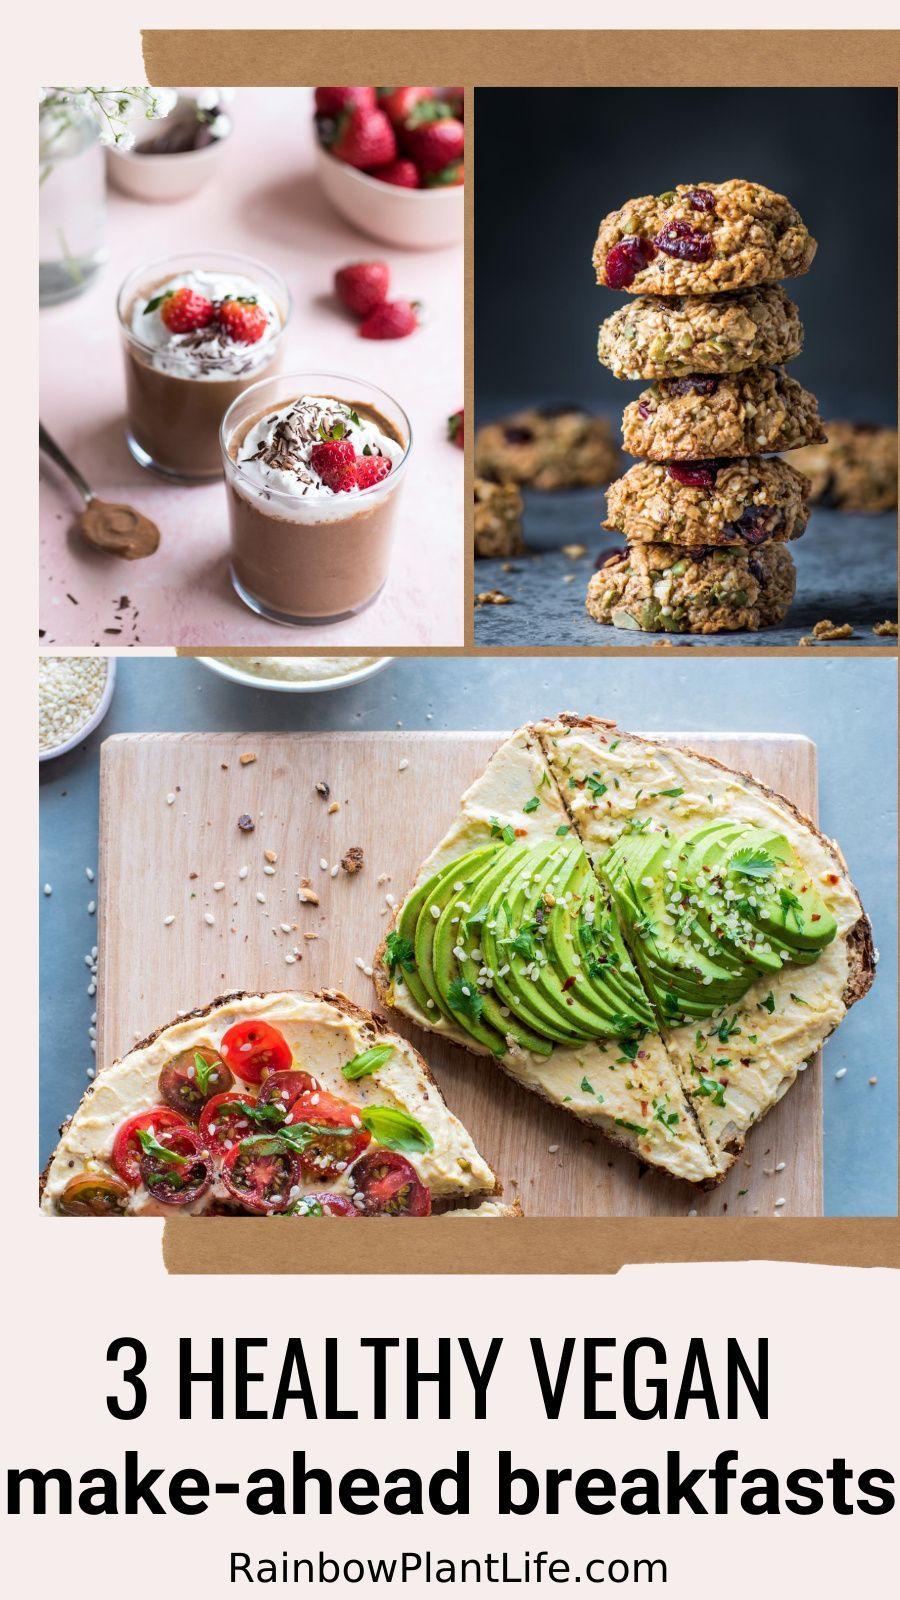 Make Ahead Breakfasts Vegan Gluten Free Oil Free Rainbow Plant Life In 2020 Make Ahead Breakfast Vegetable Recipes Vegan Instant Pot Recipes